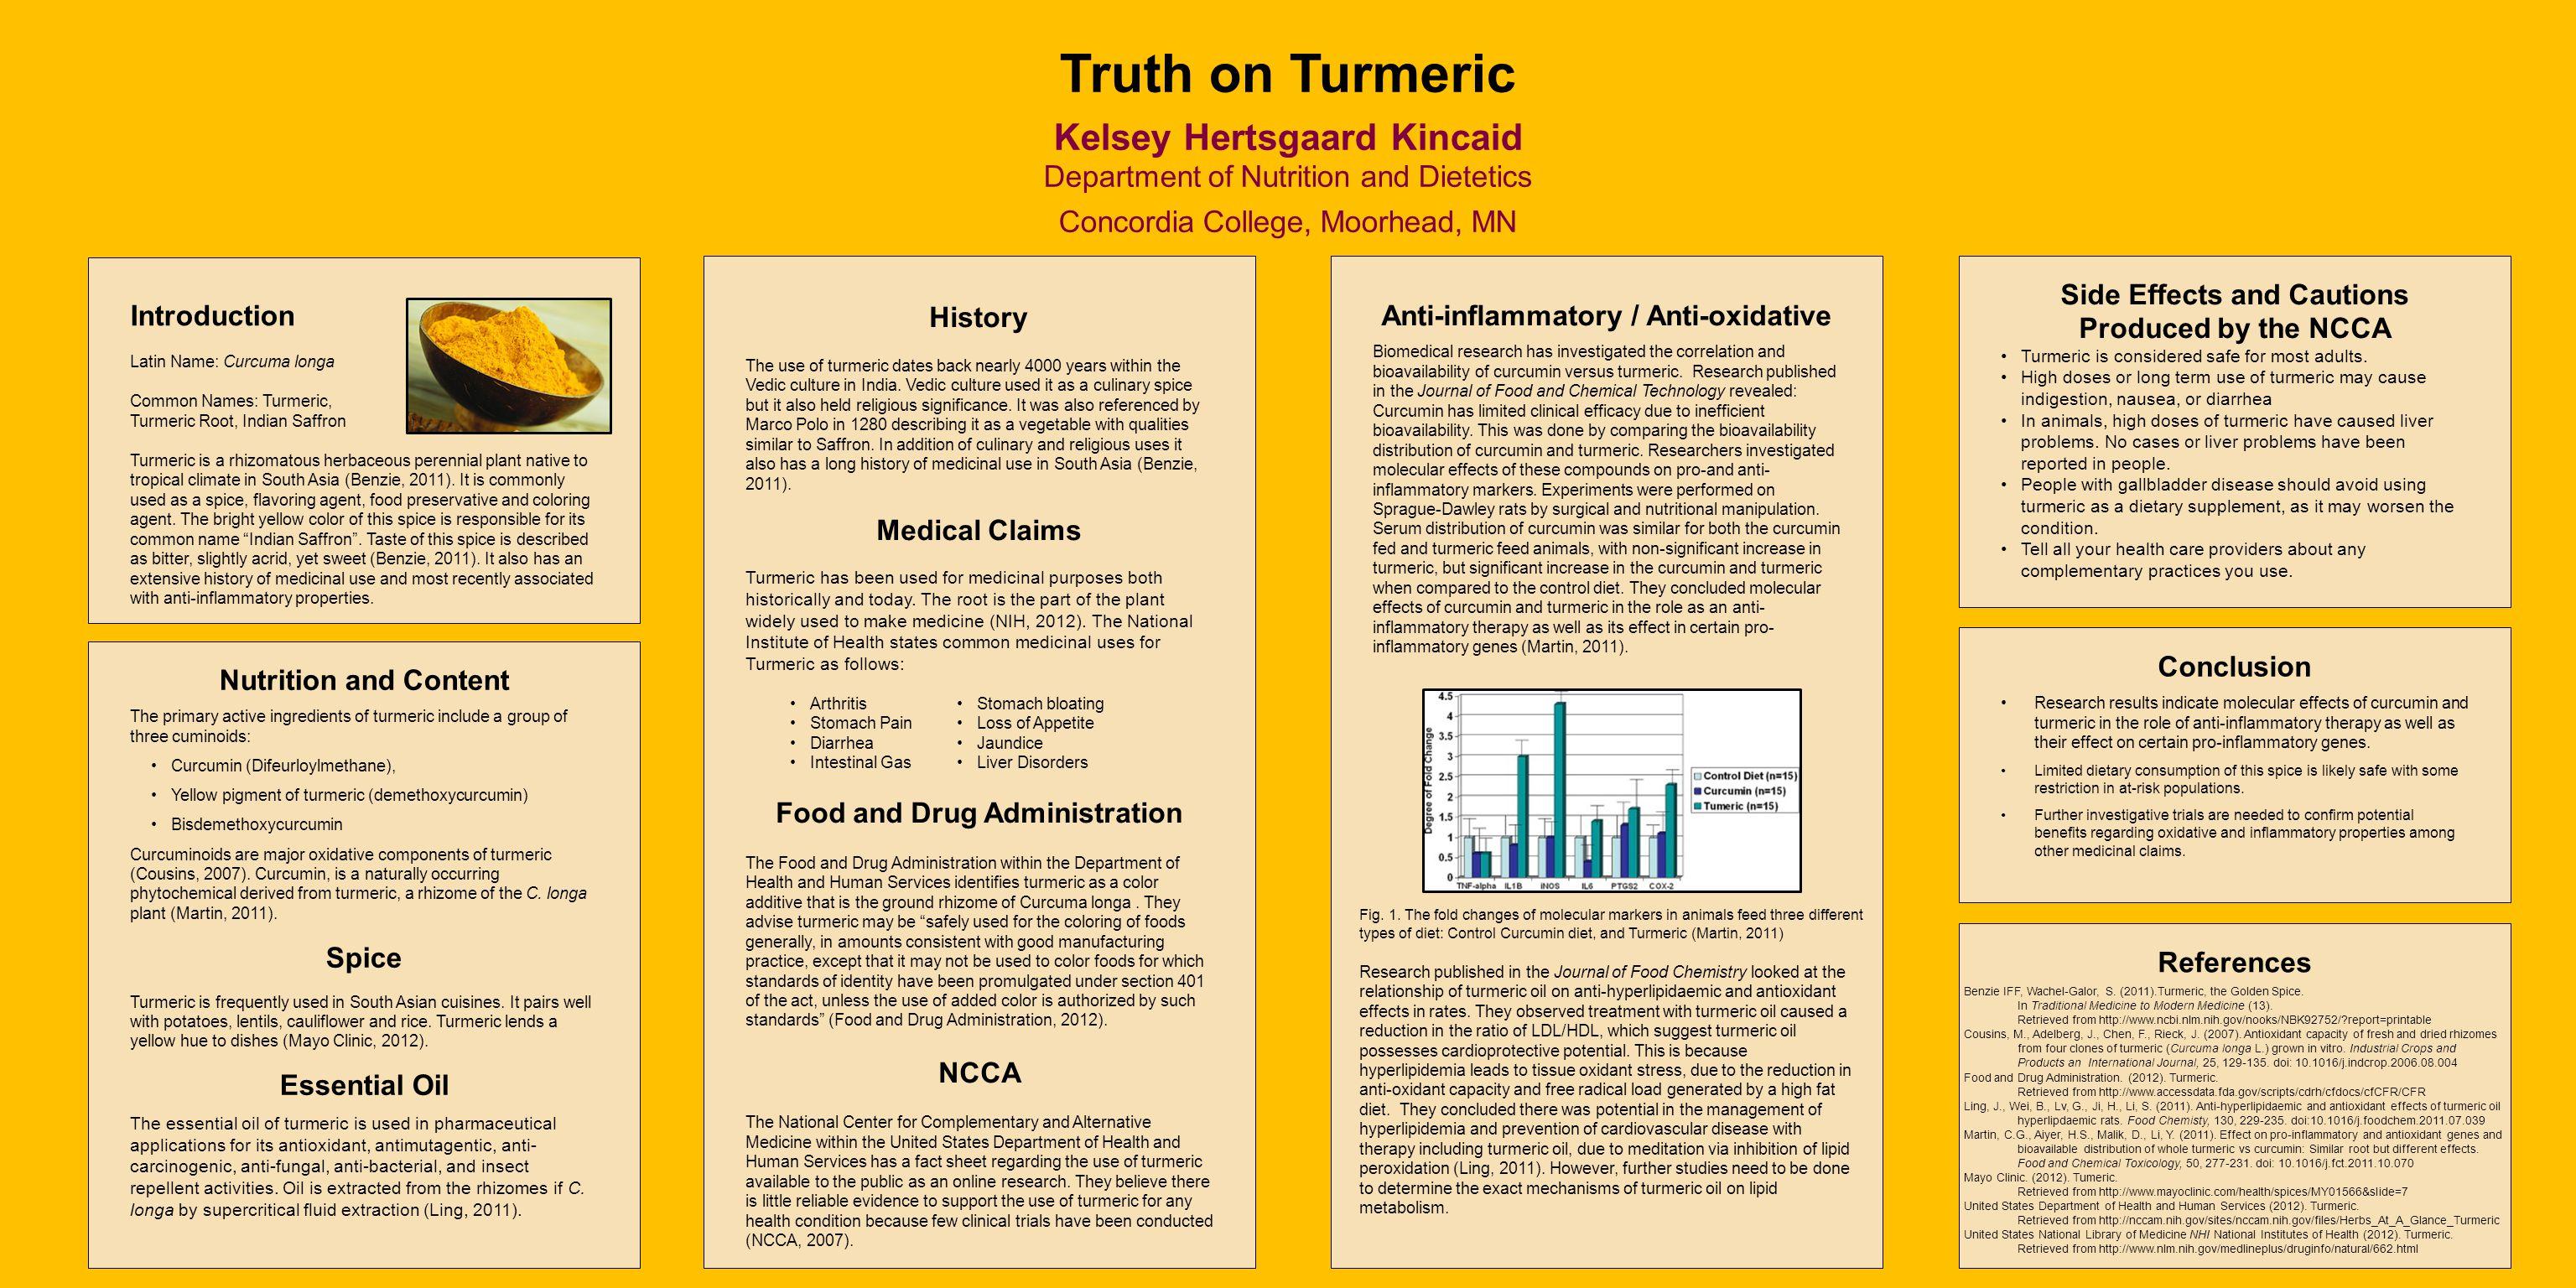 Introduction Latin Name: Curcuma longa Common Names: Turmeric, Turmeric Root, Indian Saffron Turmeric is a rhizomatous herbaceous perennial plant native to tropical climate in South Asia (Benzie, 2011).